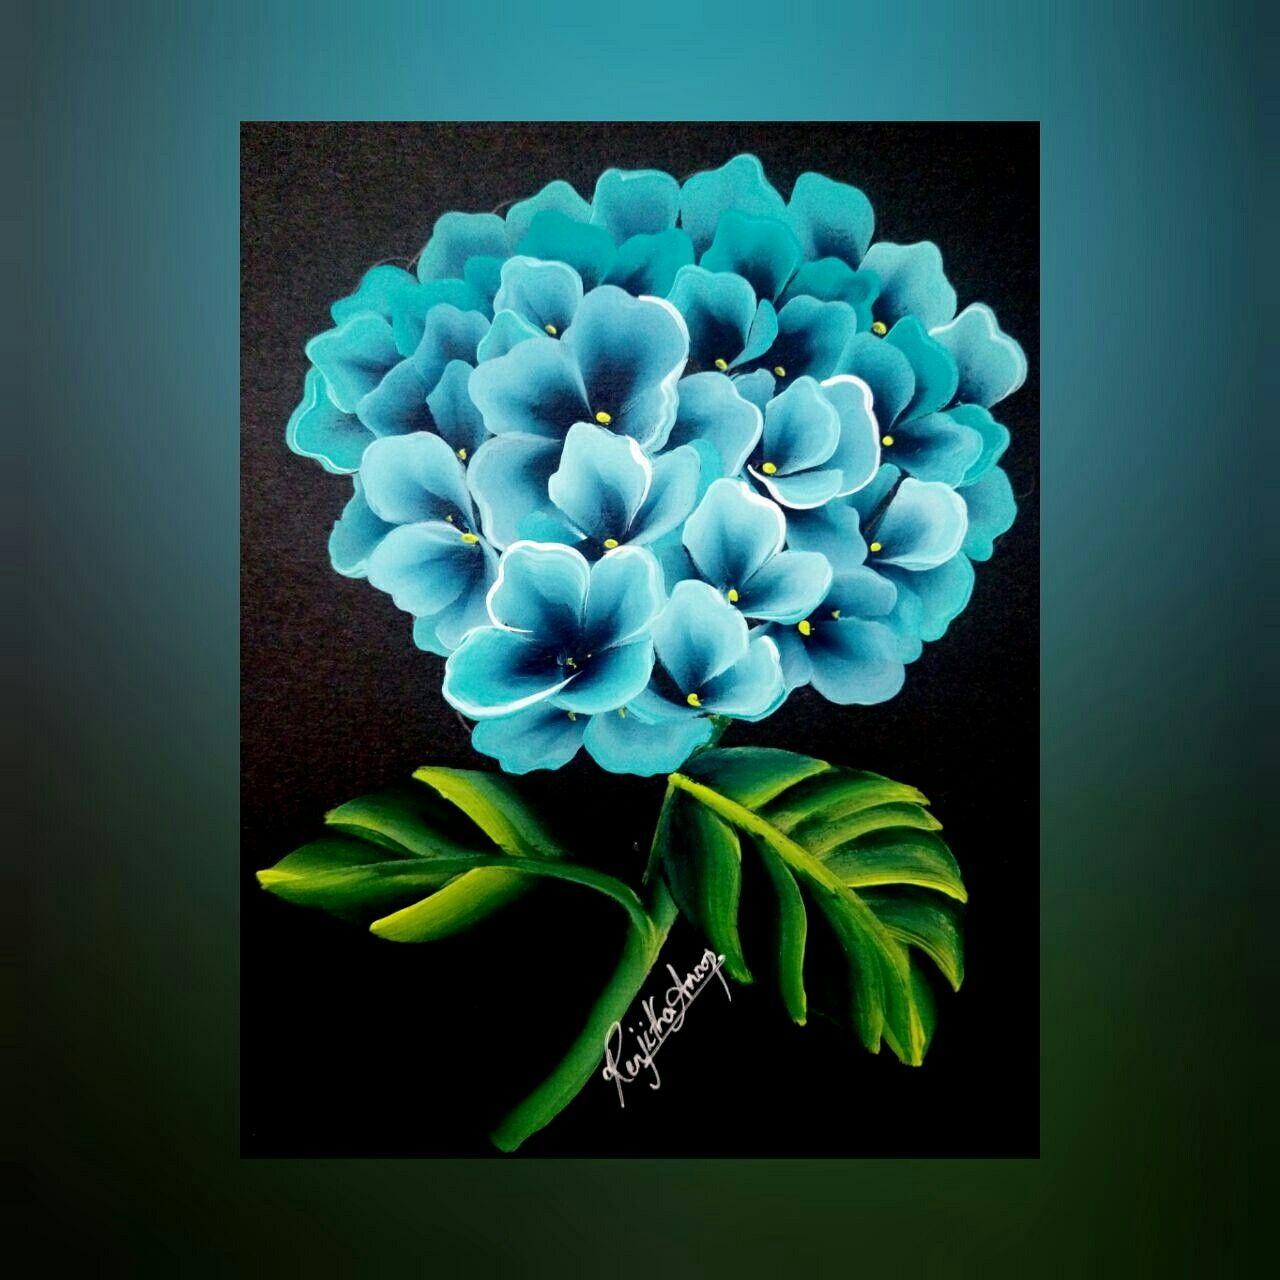 One Stroke Painting Hydrangea Acrylic Painting Hydrangea Flower Painting Renjitha Anoop Acrylic Painting Flowers Flower Painting Hydrangea Painting